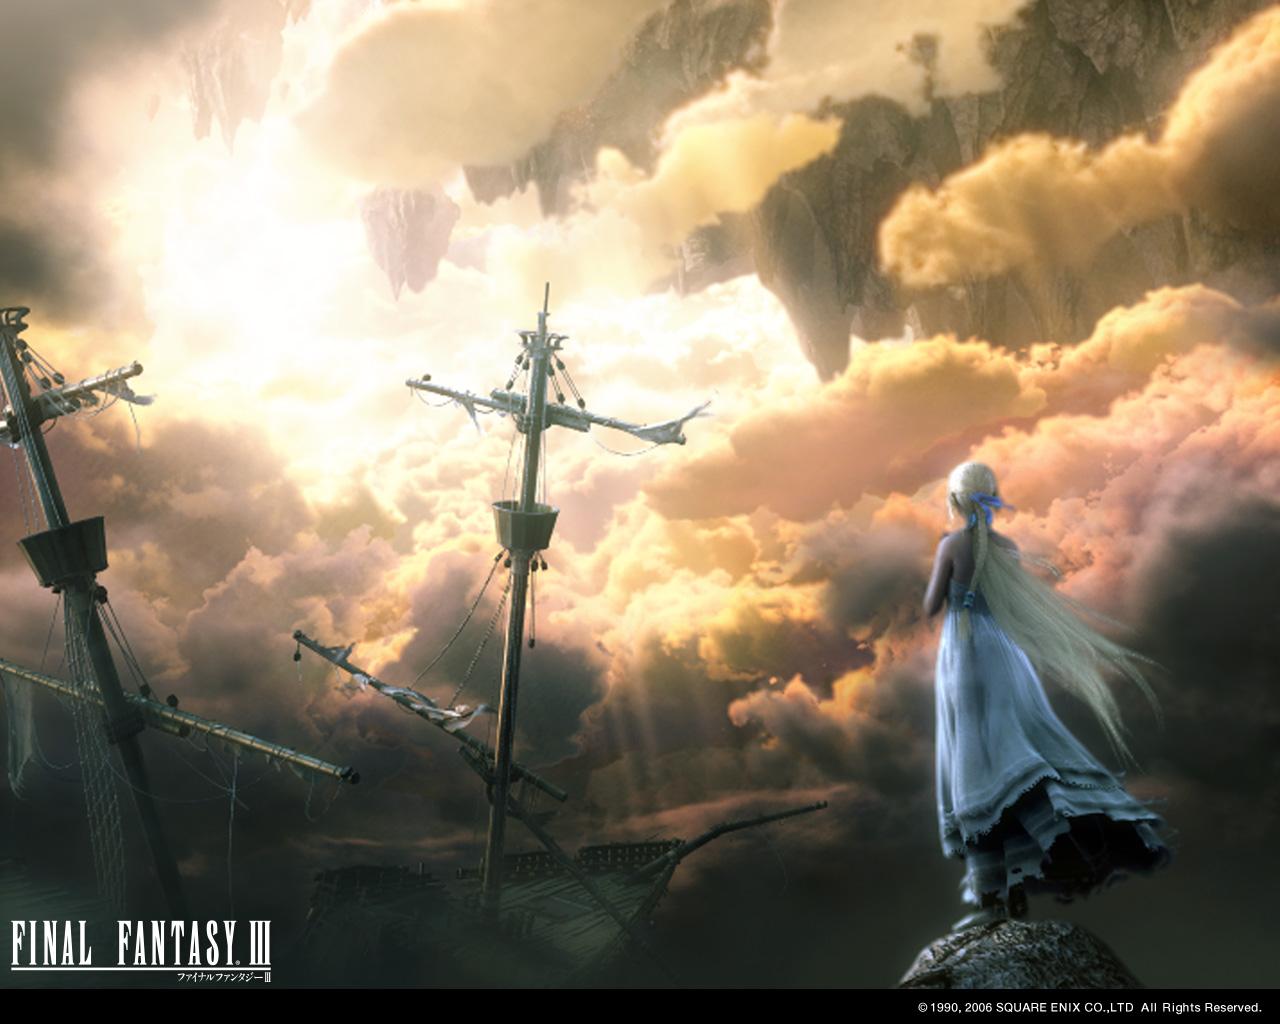 https://1.bp.blogspot.com/-aUO59JFqaic/UCeHeADoHtI/AAAAAAAACi4/VpFAdJjOxFk/s1600/final-fantasy-iii-wallpaper-1.jpg